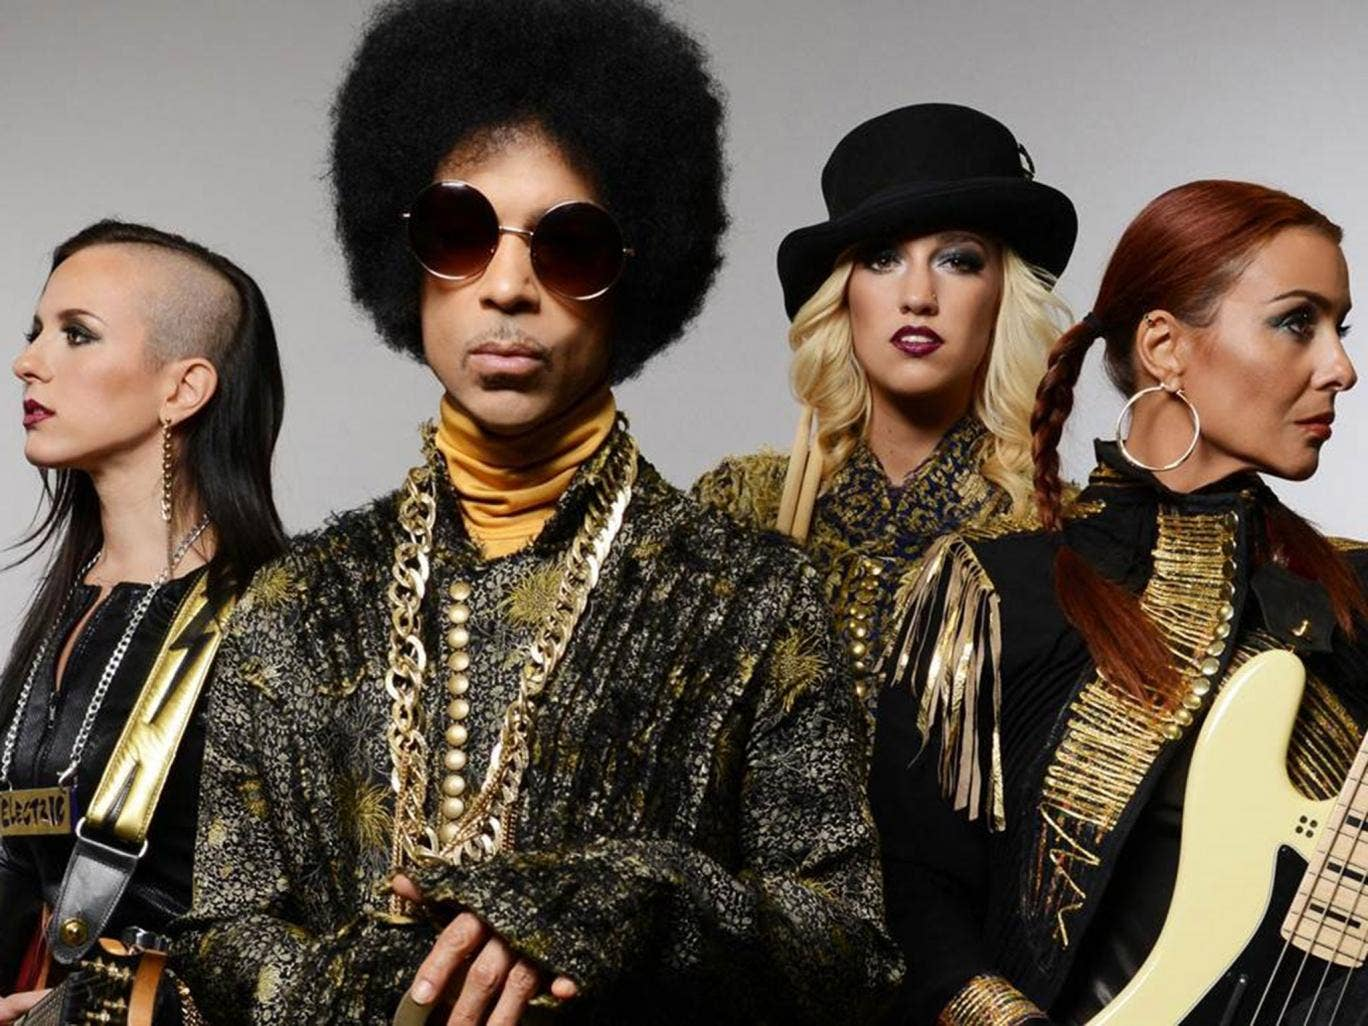 Prince and 3RDEYEGIRL are releasing Plectrum Electrum next month